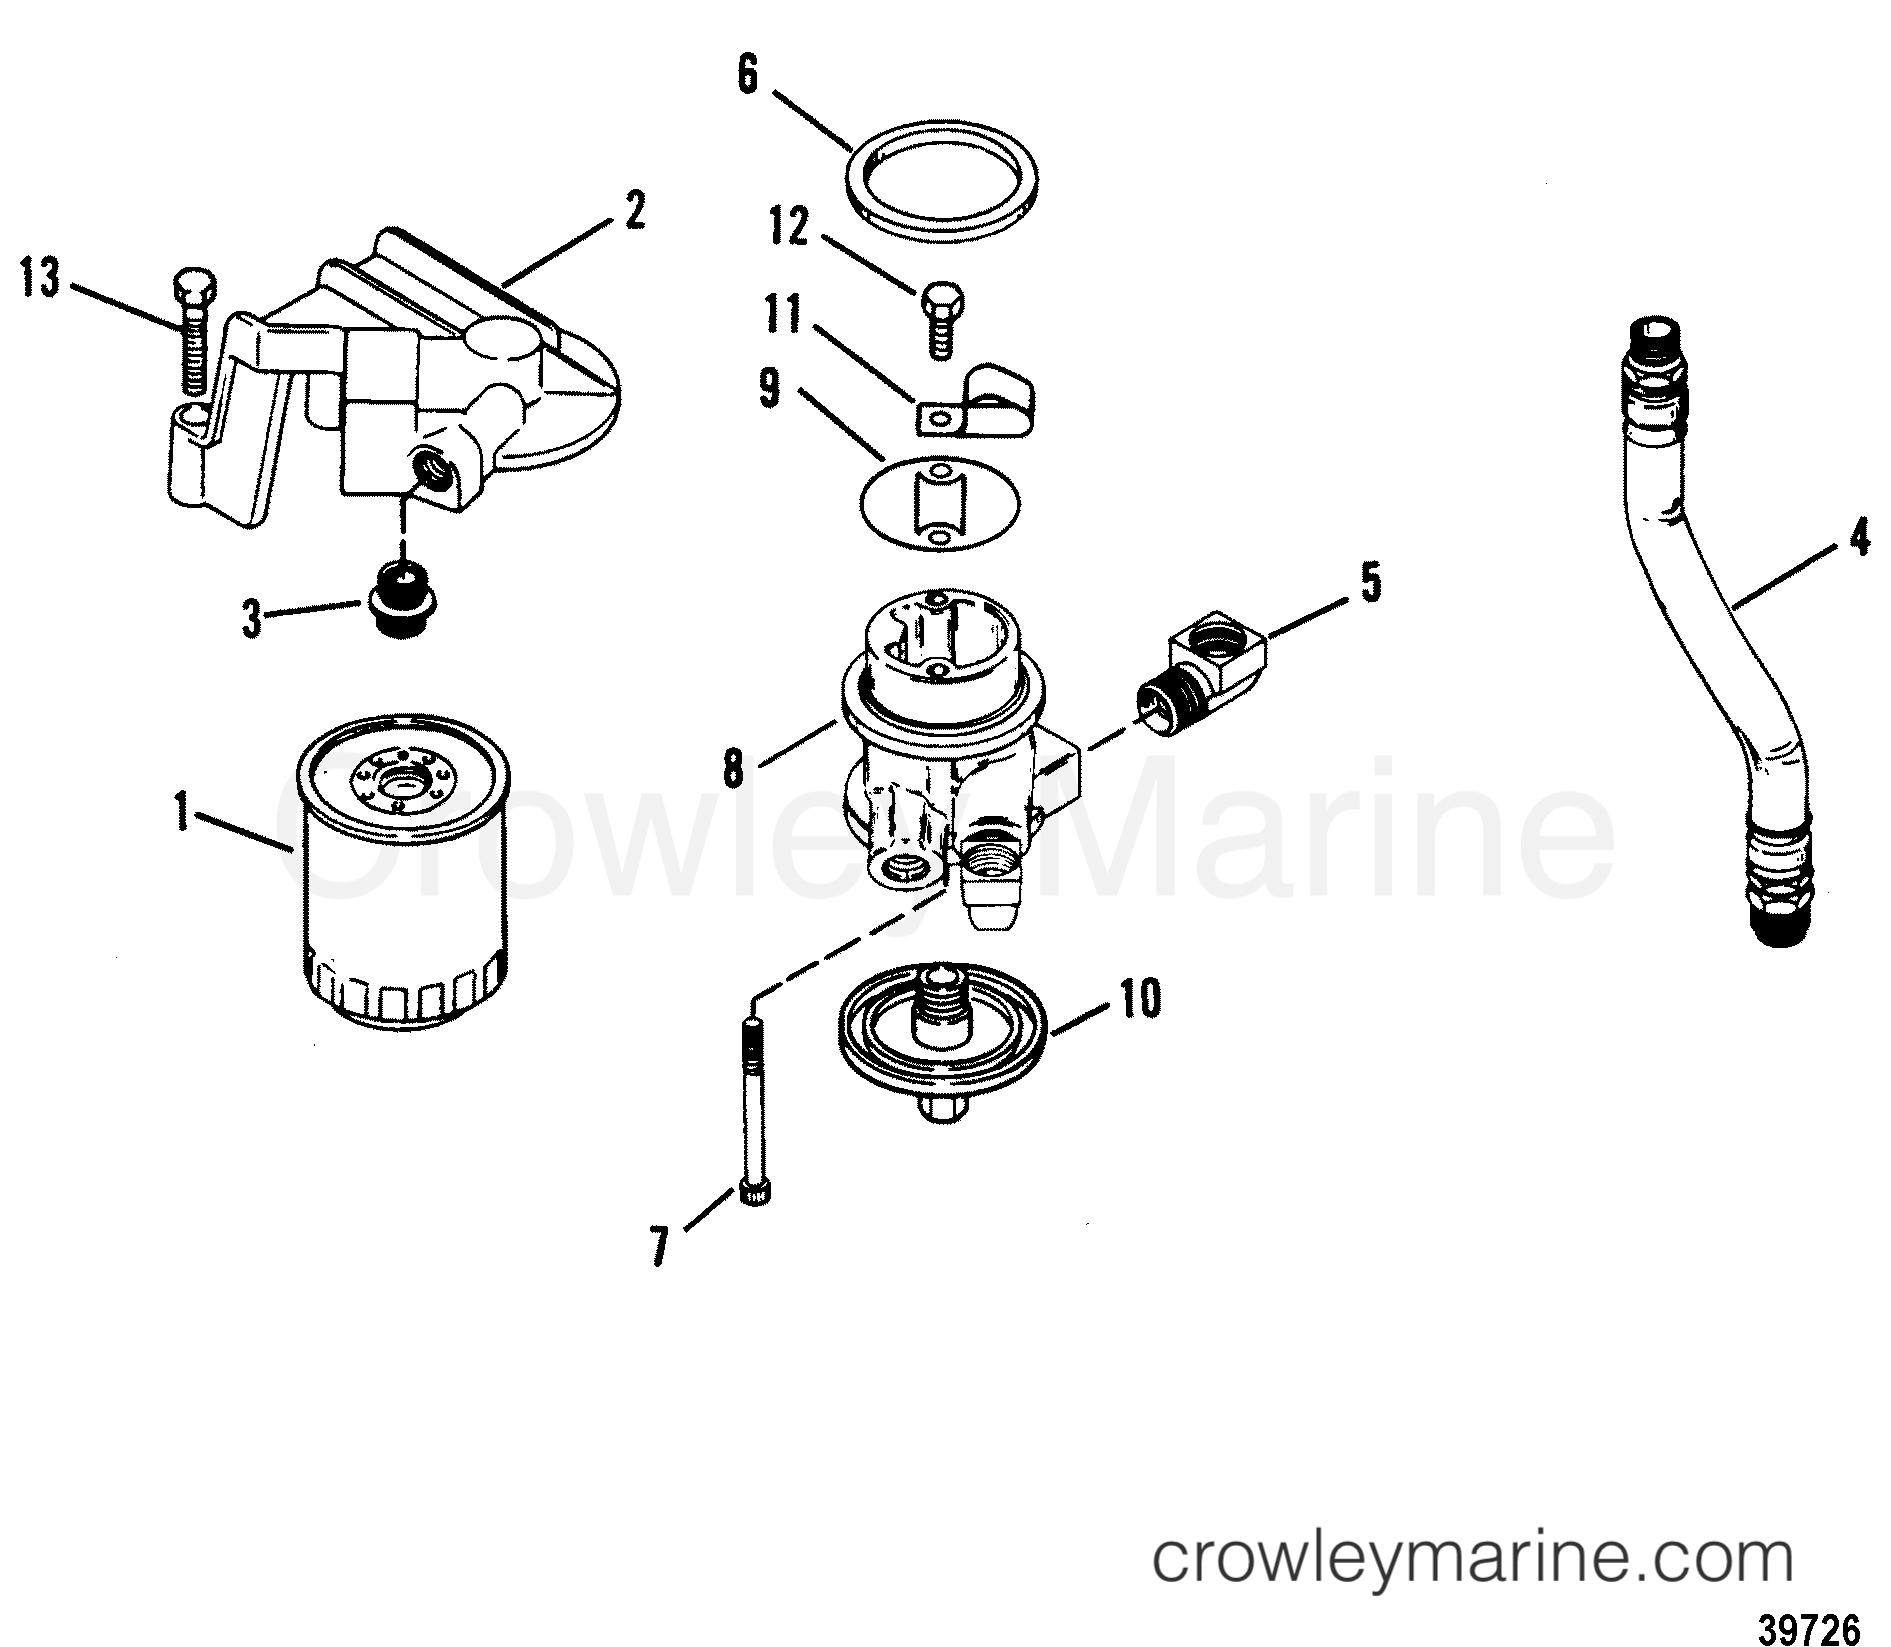 Mercruiser 4 3lx Wiring Diagram : Remote oil filter mercruiser lx alpha